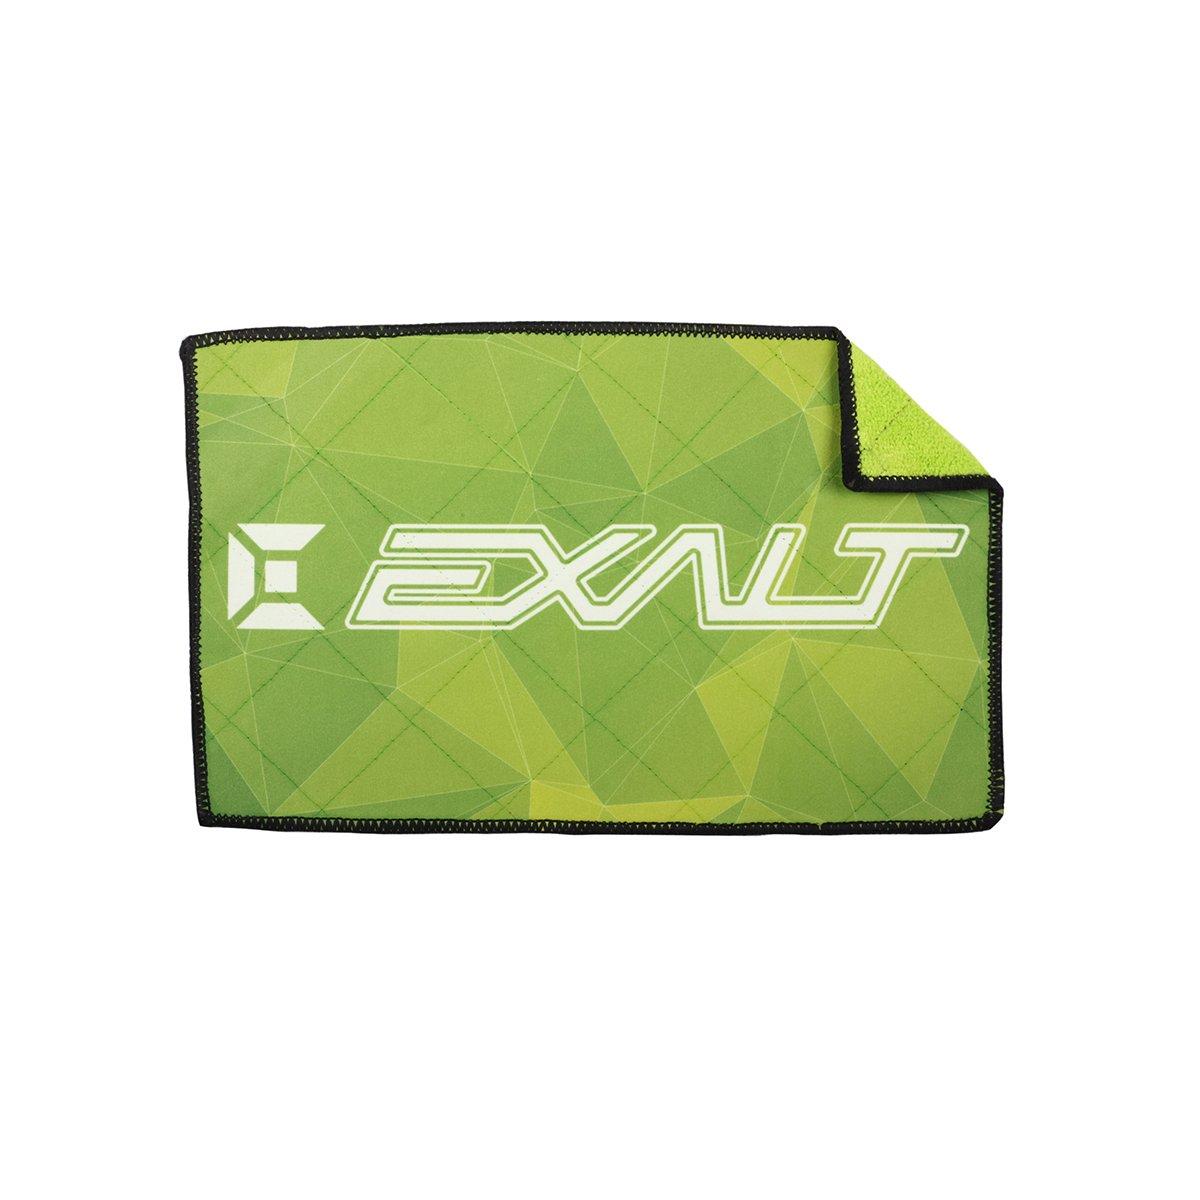 Exalt Paintball Microfiber Goggle Cloth - Player Size - Crystal Neon by Exalt